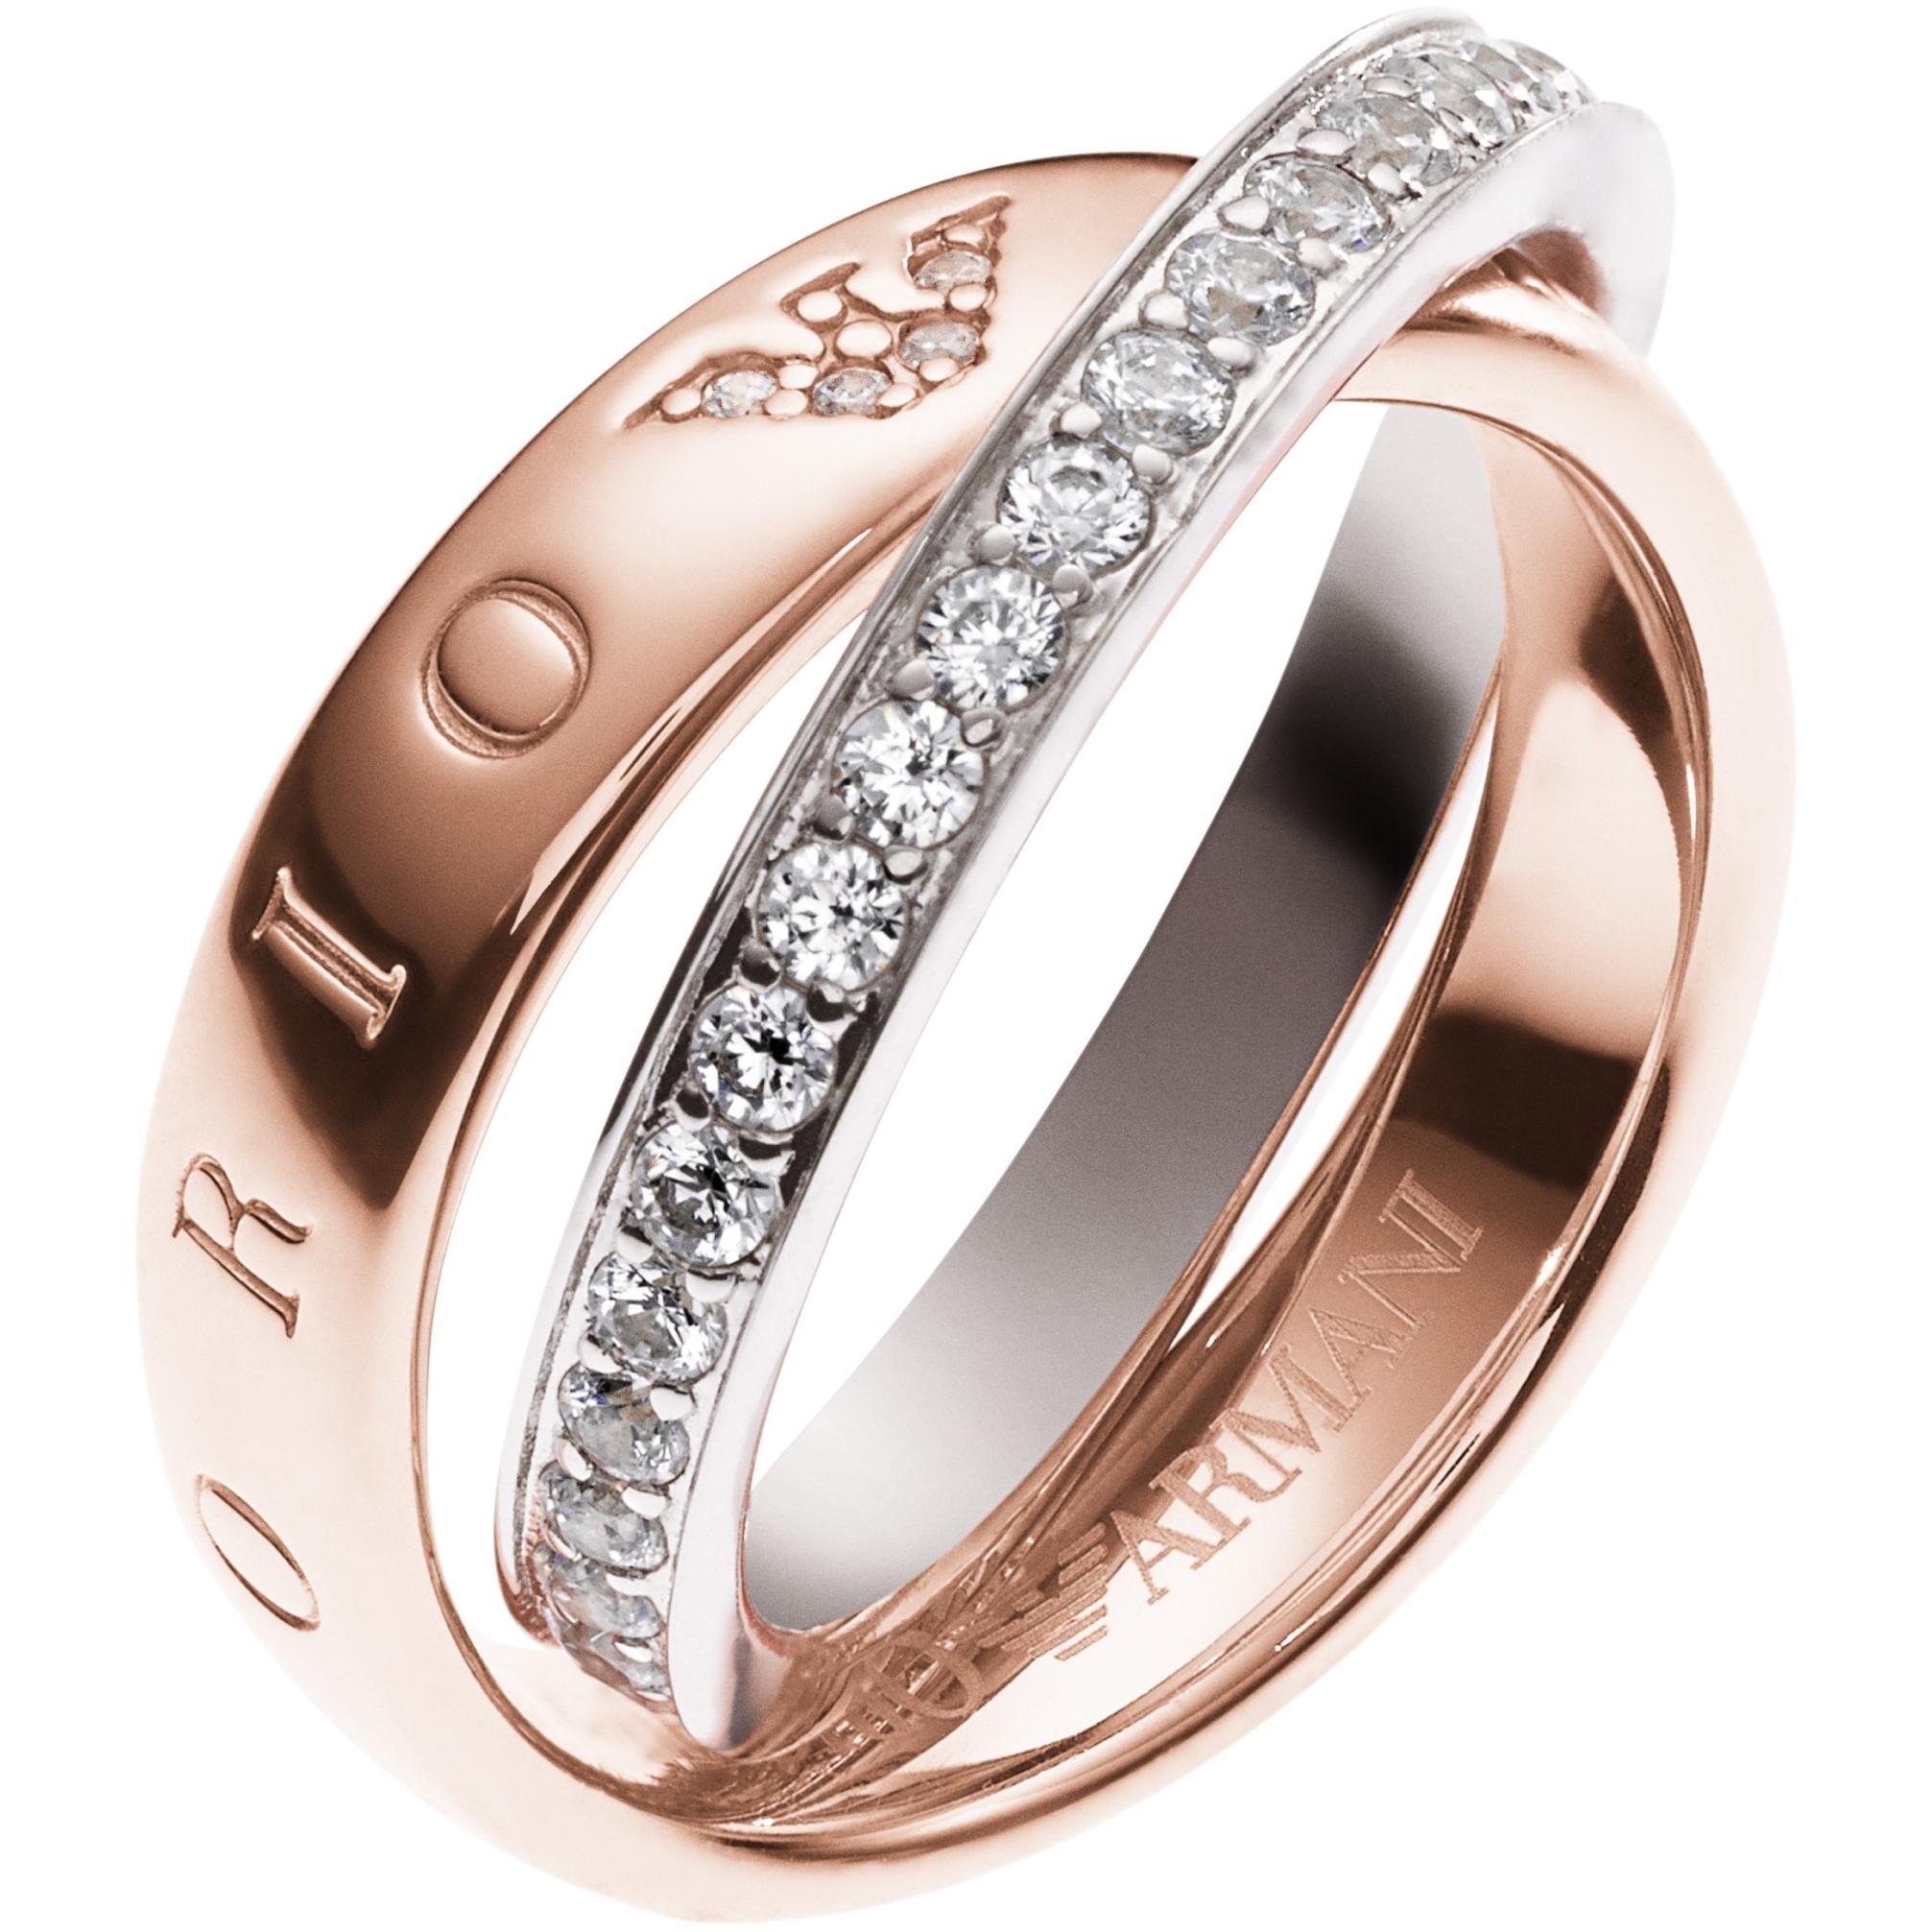 2b4ba6bc50f1f Bijoux Femme Emporio Armani Pure Eagle Circles Bague EG3123221503   FR    Watch Shop™